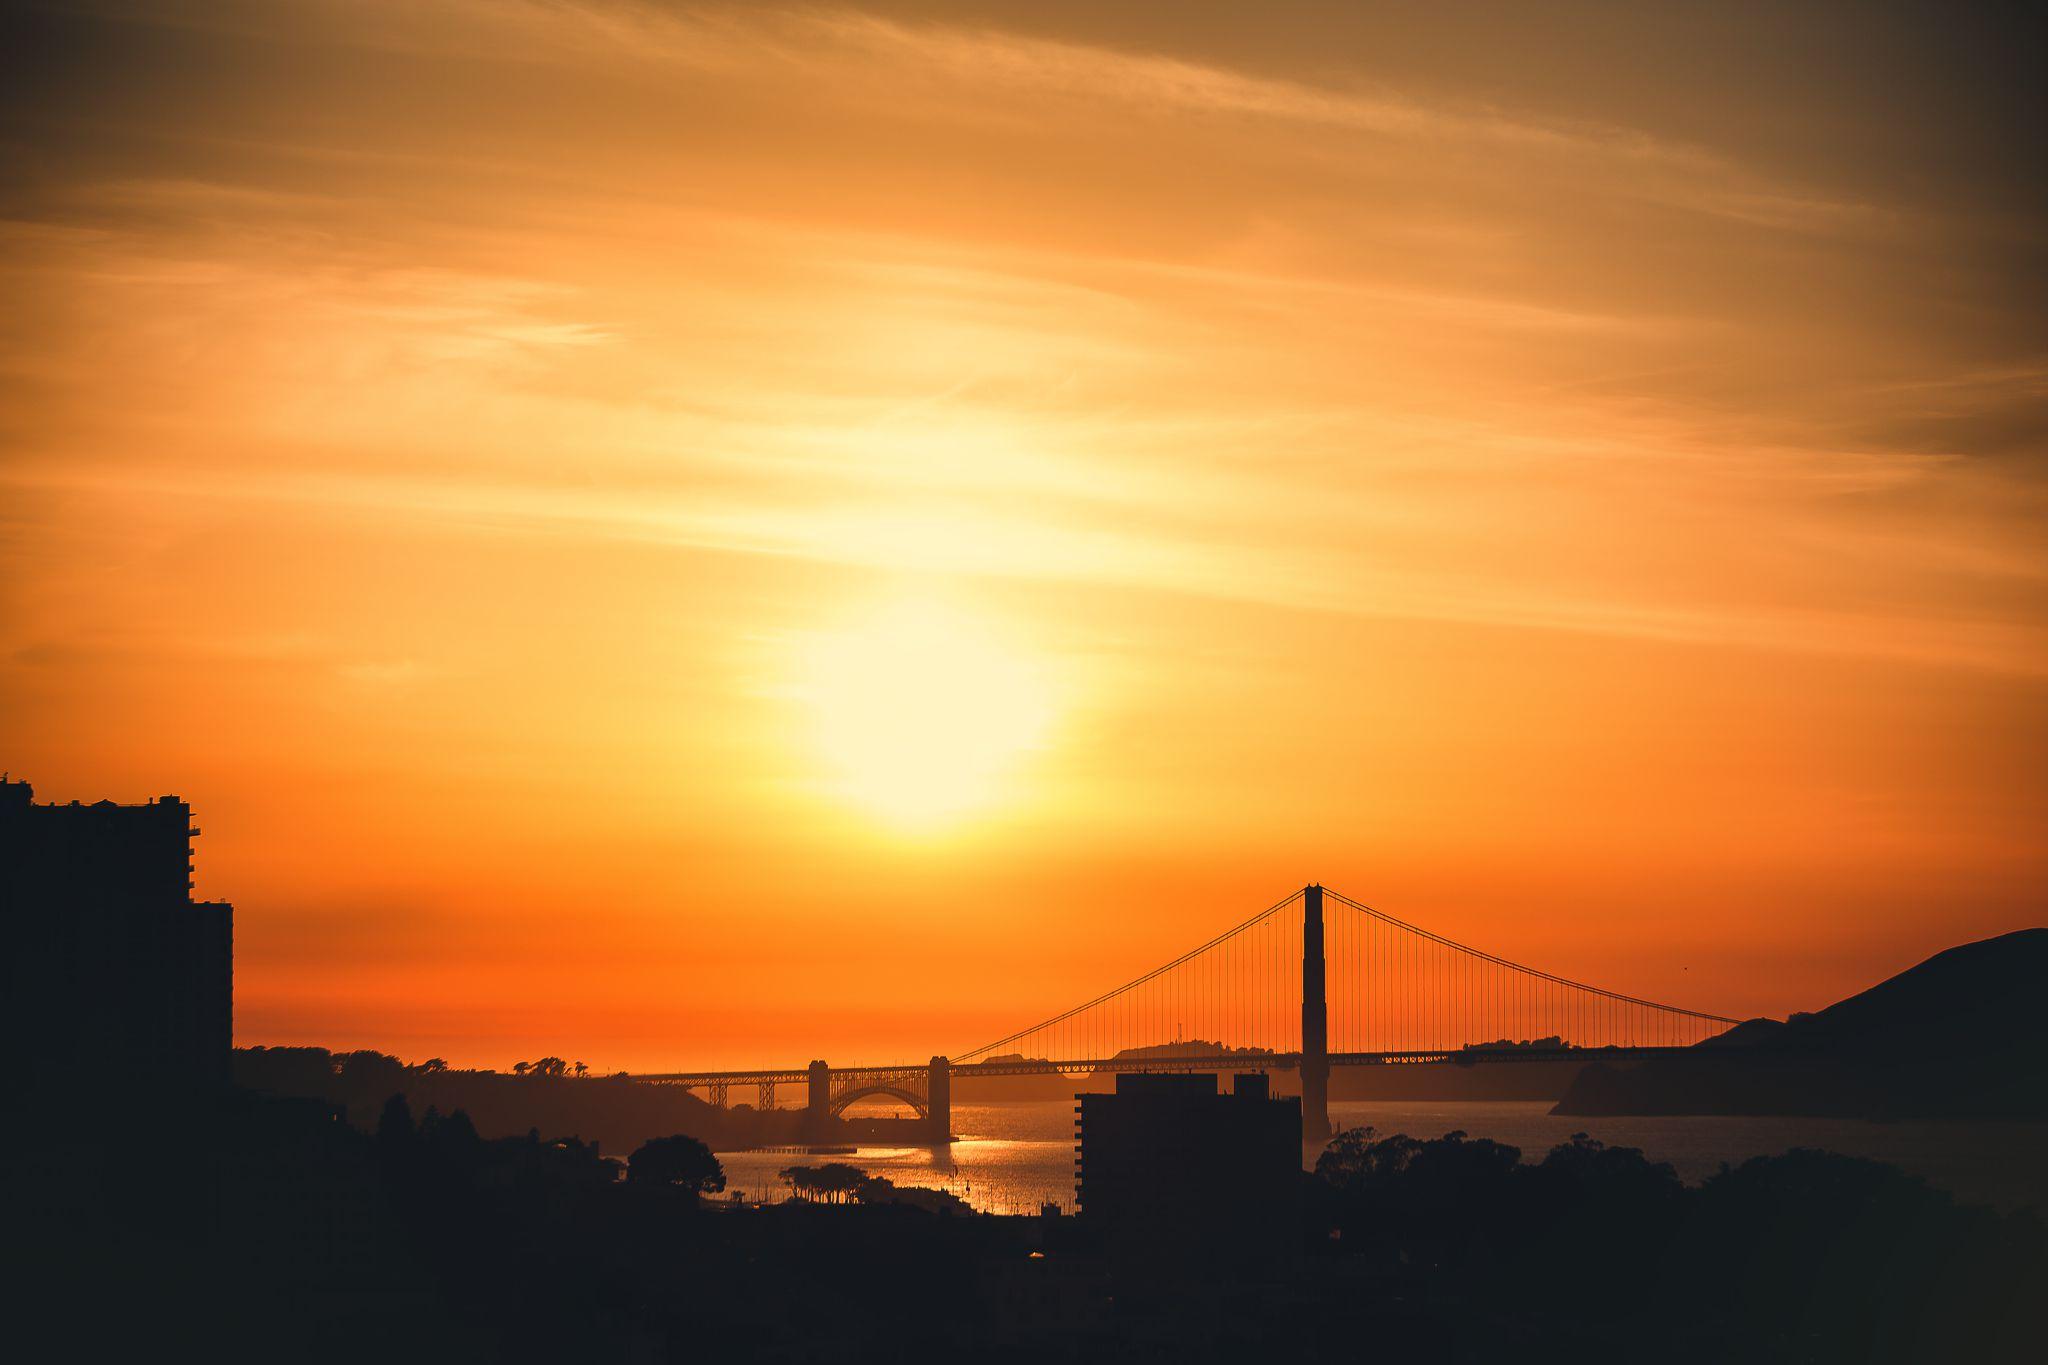 Silhouette Bay Bridge Against Orange Sunset Sky Seen From Coit Tower